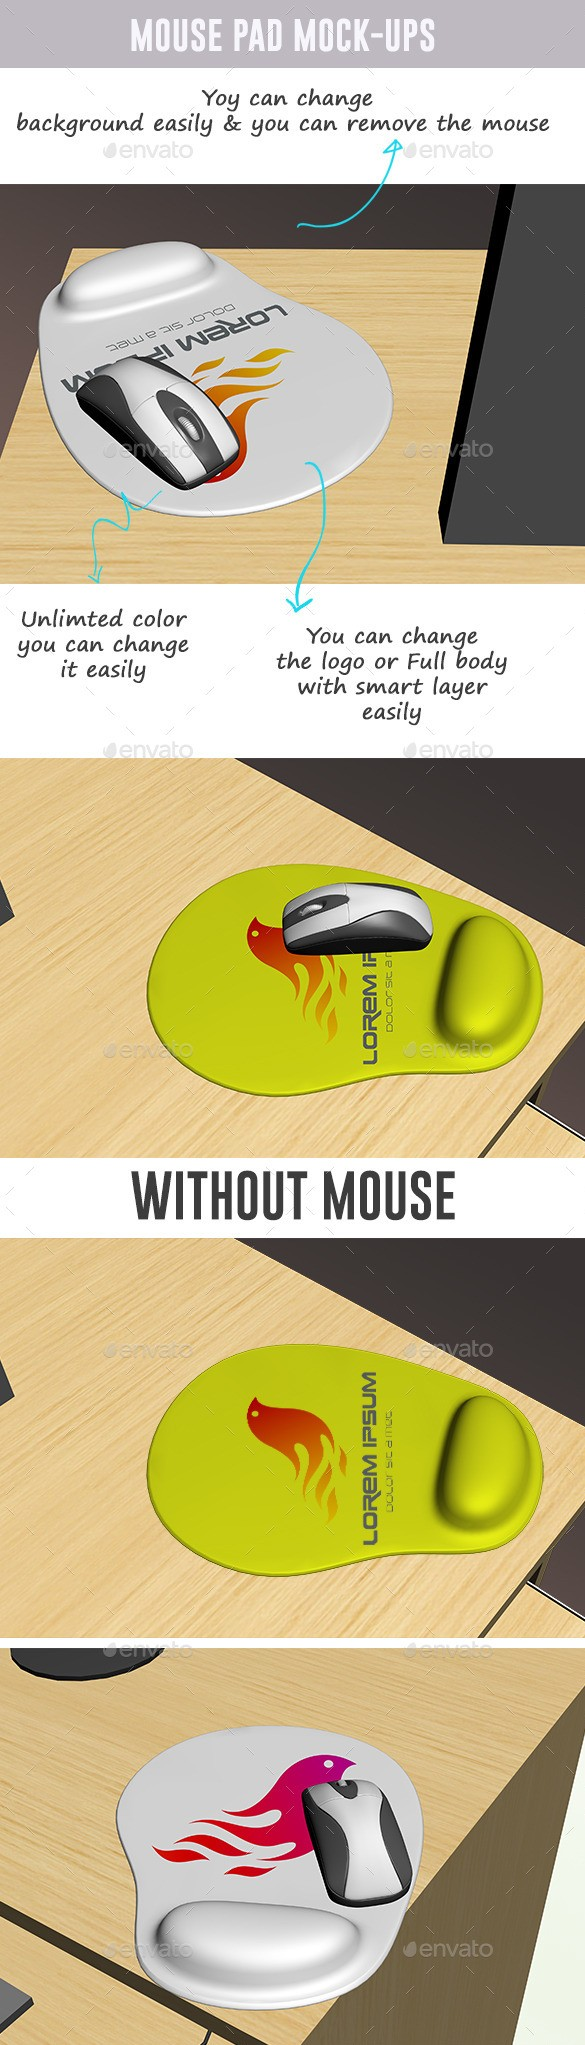 Mouse Pad Mockups